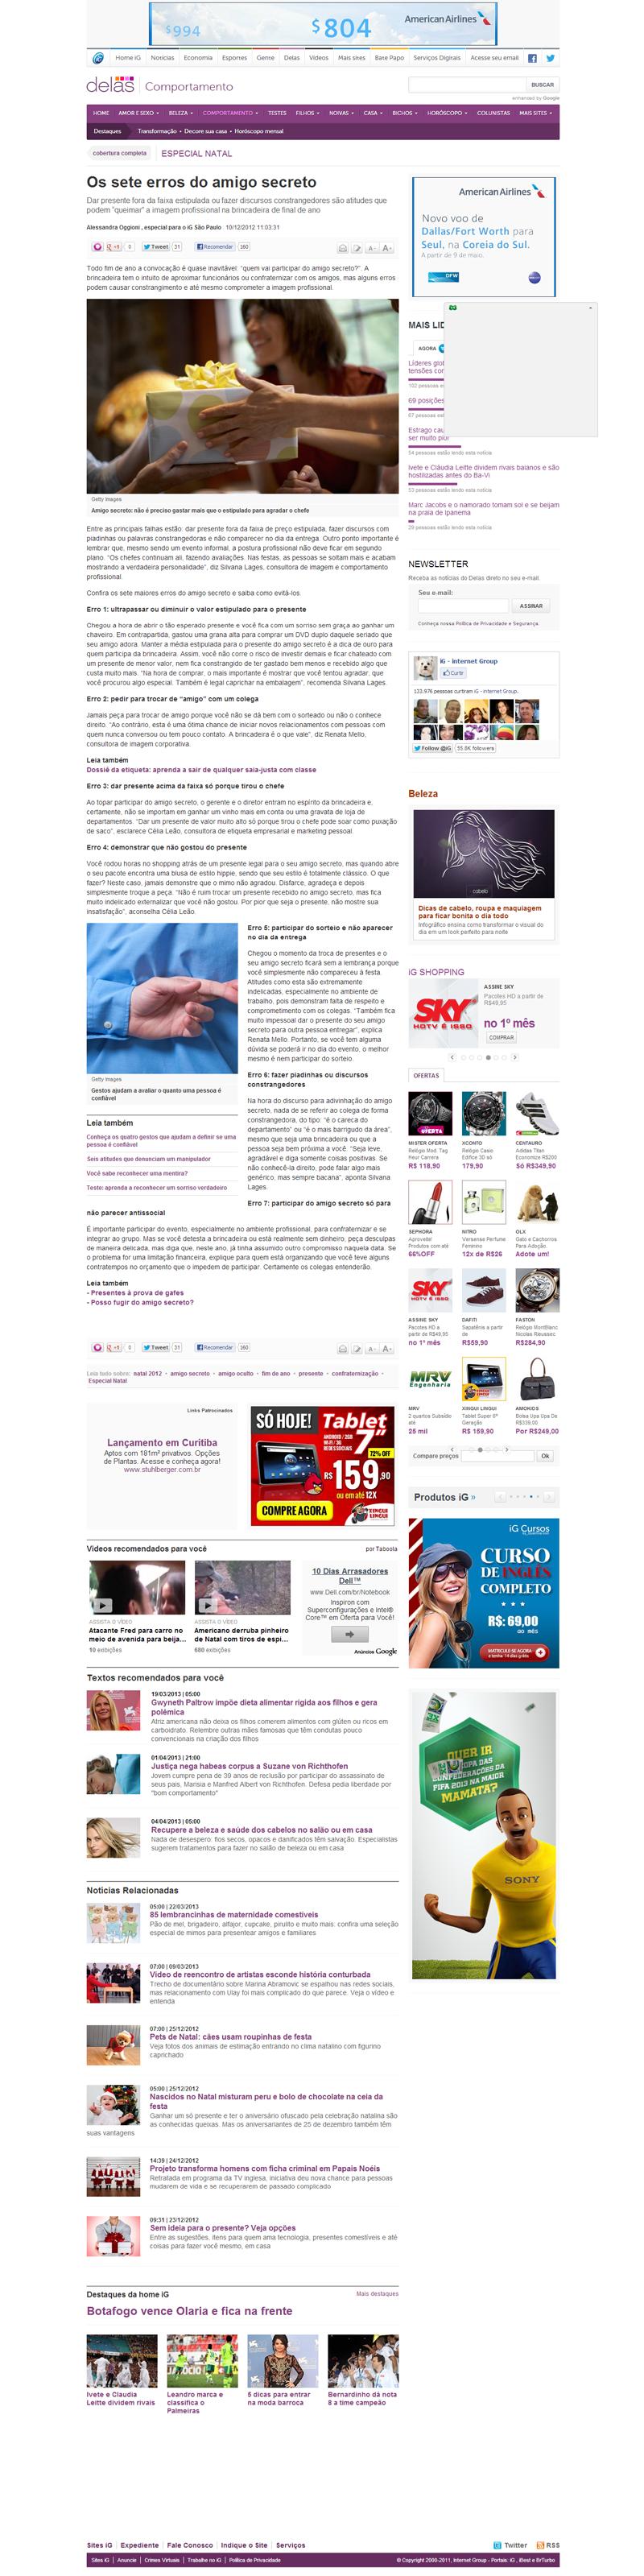 Portal Ig - 15/12/2012 (http://bit.ly/11HPgr5)